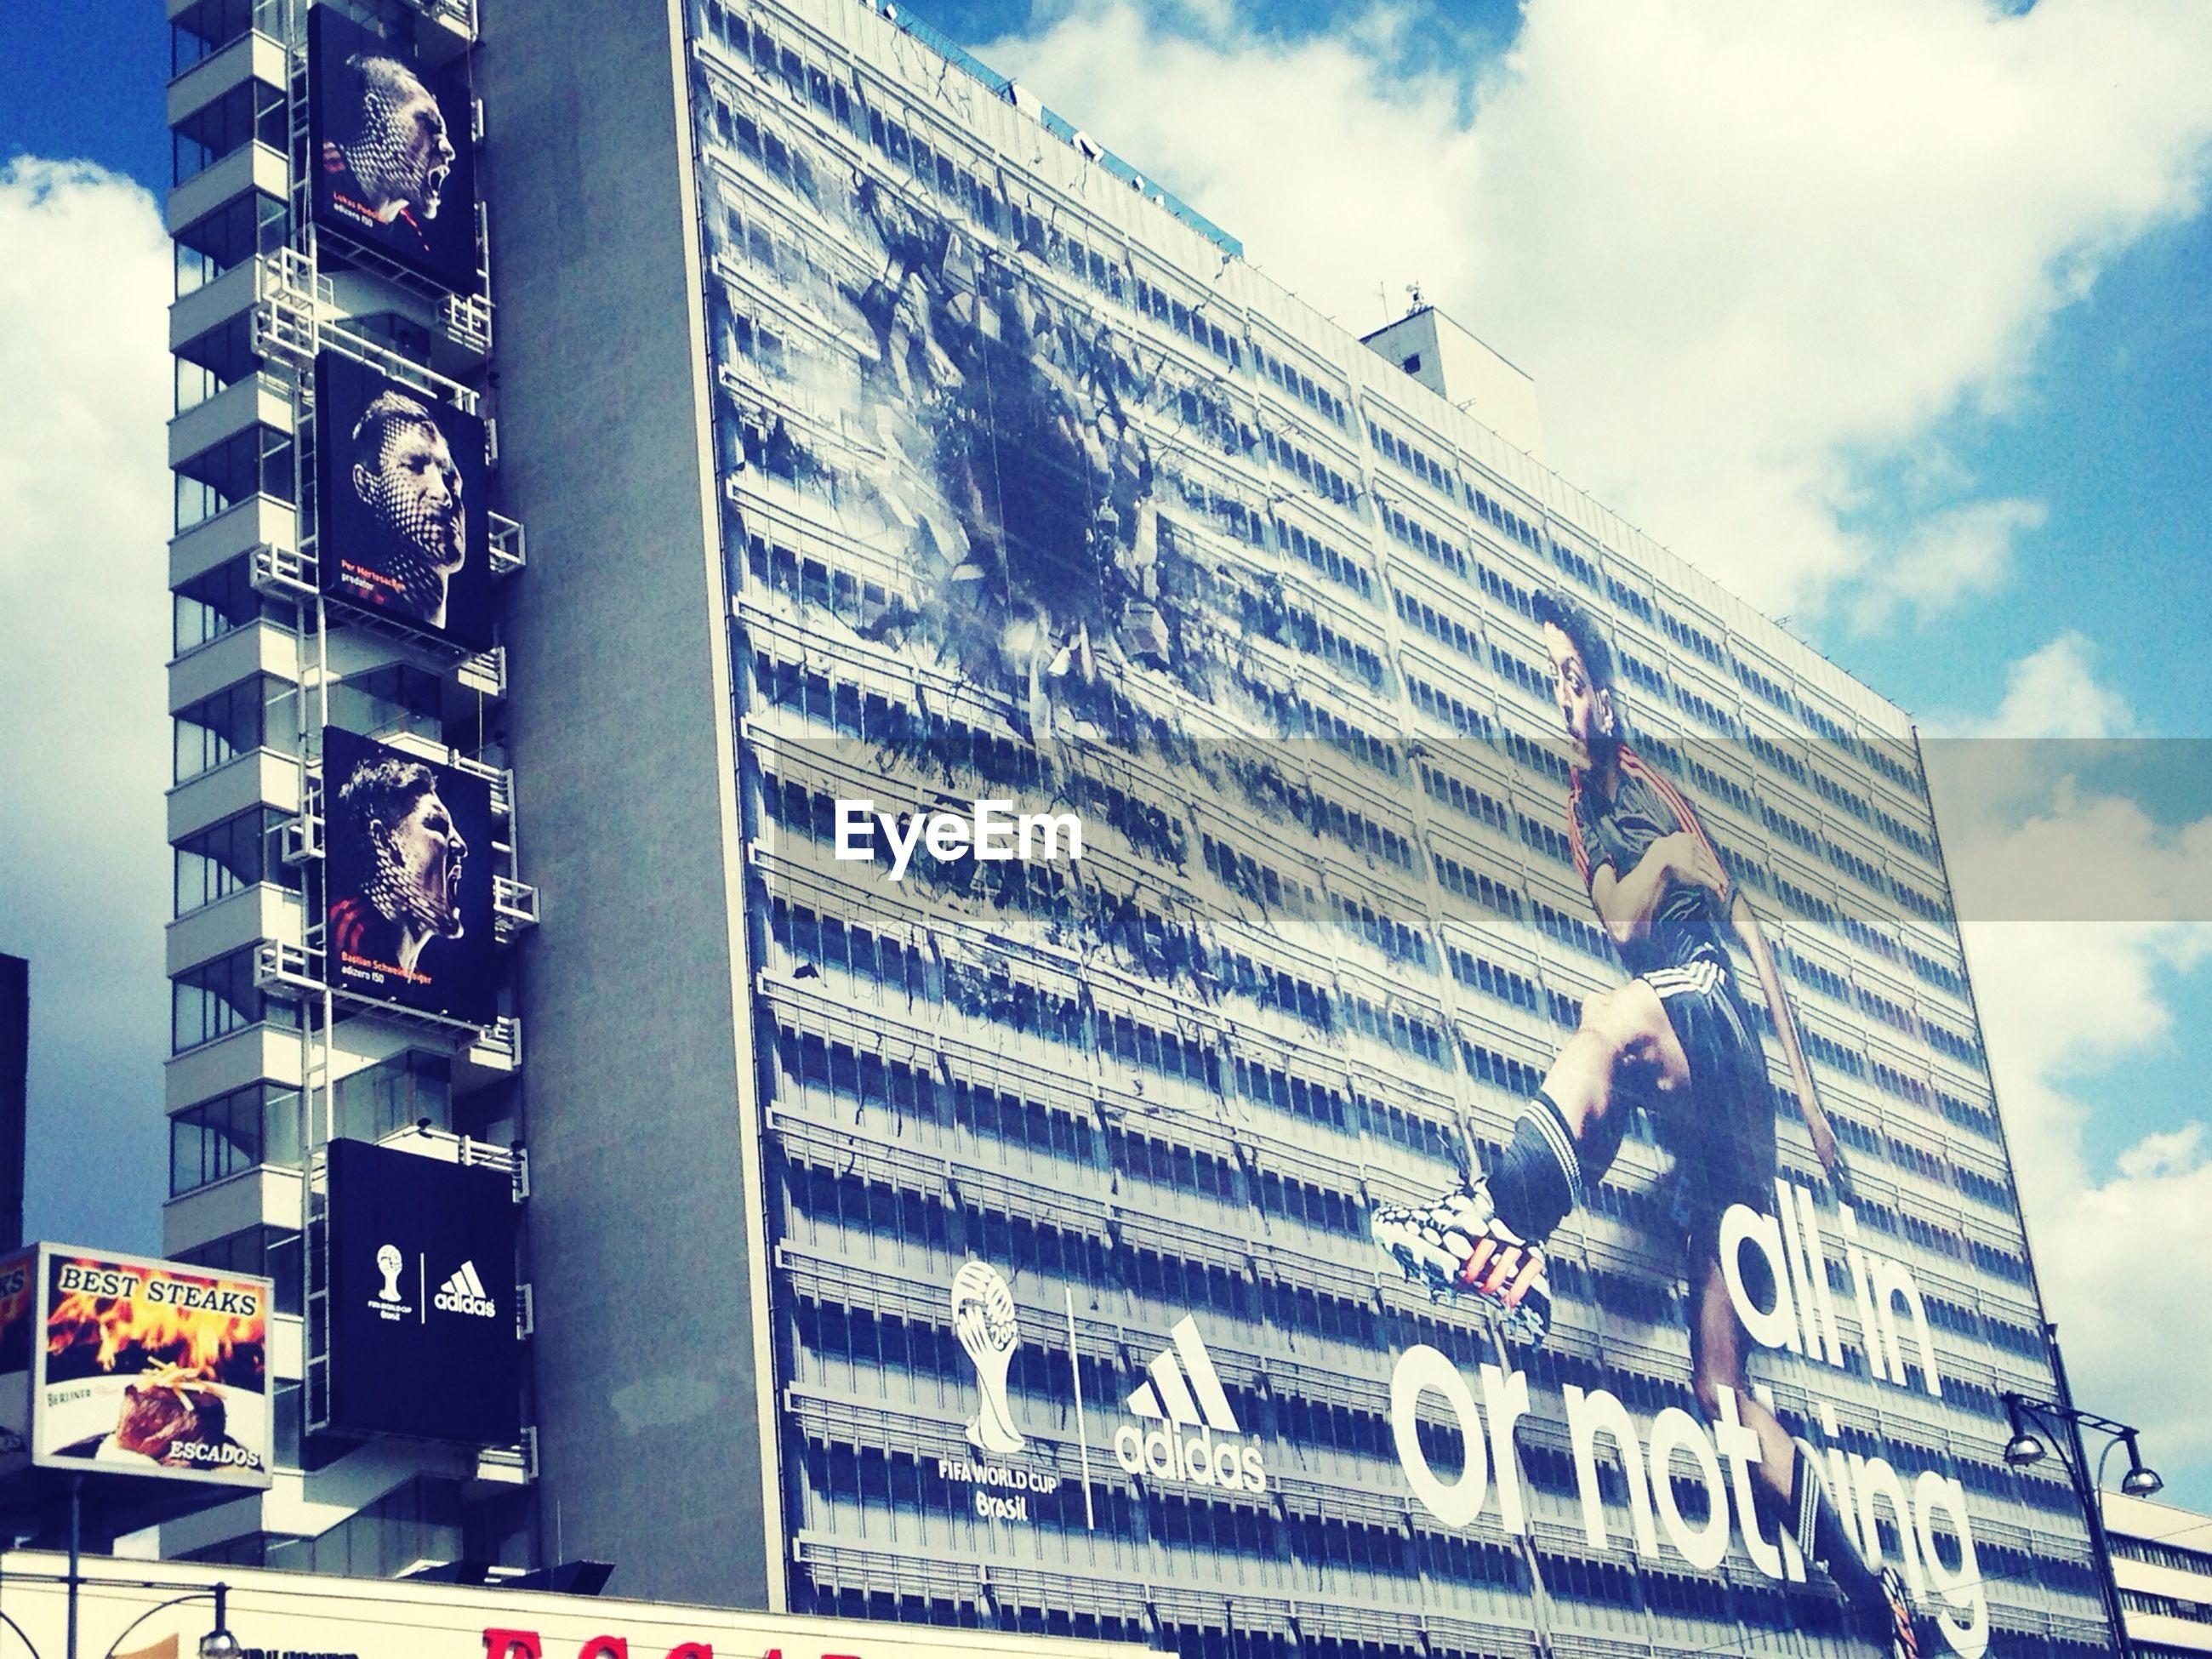 low angle view, architecture, building exterior, built structure, sky, city, building, modern, office building, city life, day, blue, outdoors, sunlight, text, western script, men, cloud - sky, cloud